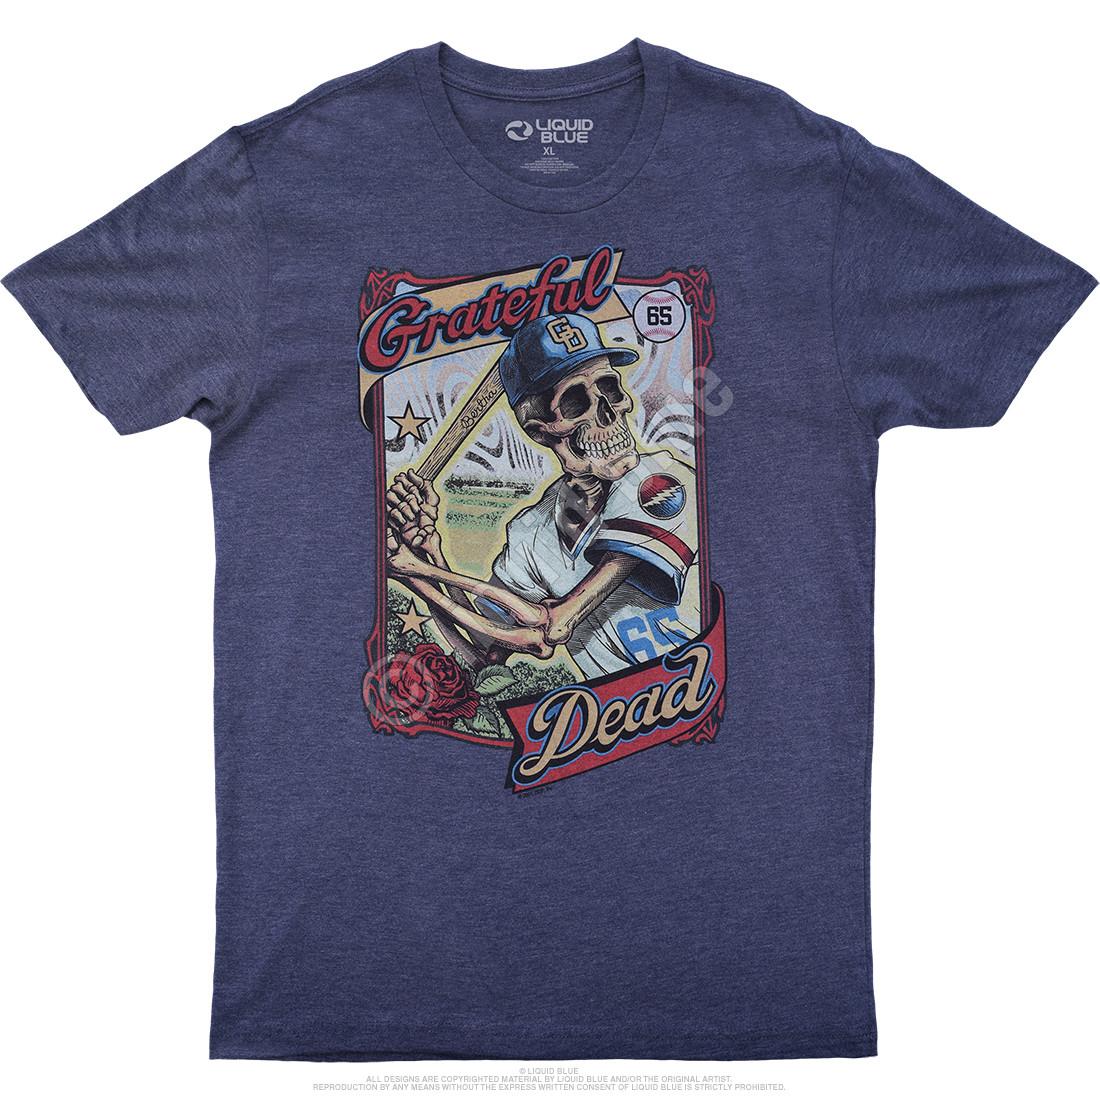 GD On-Deck Dark Blue Heather Poly-Cotton T-Shirt